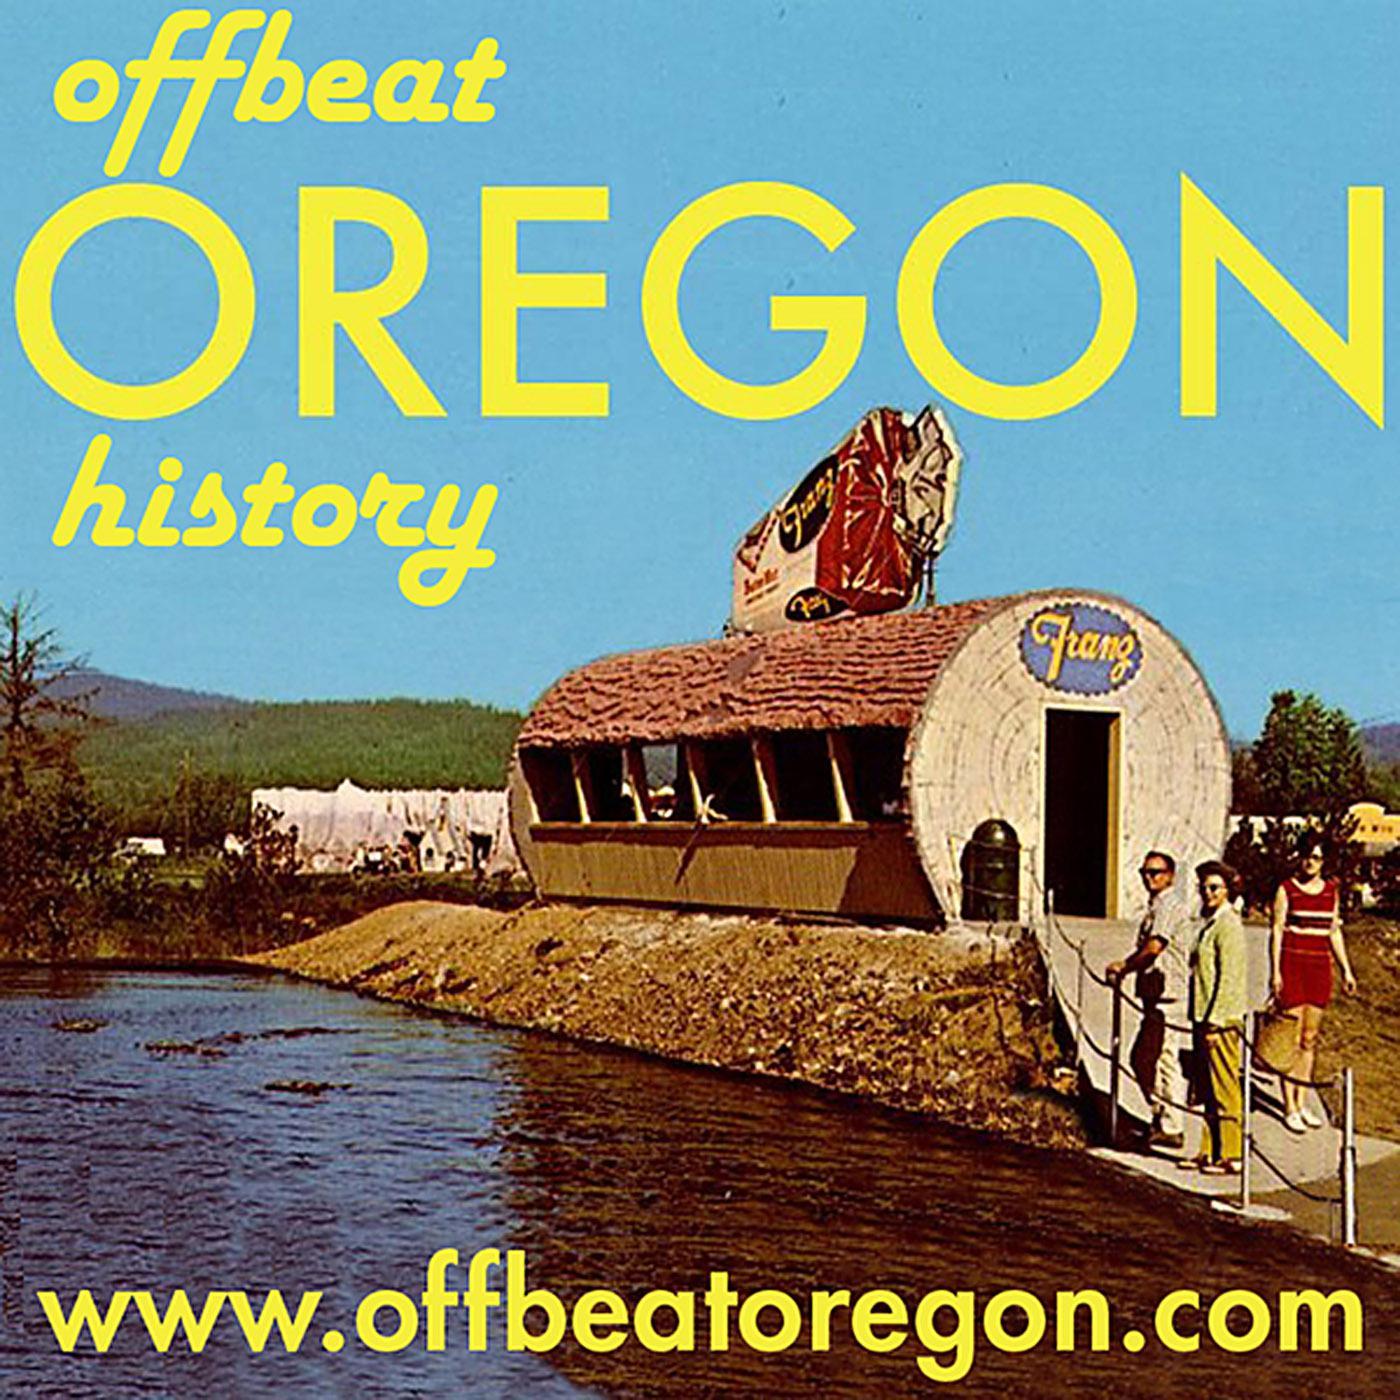 Offbeat Oregon History podcast - www offbeatoregon com (finn